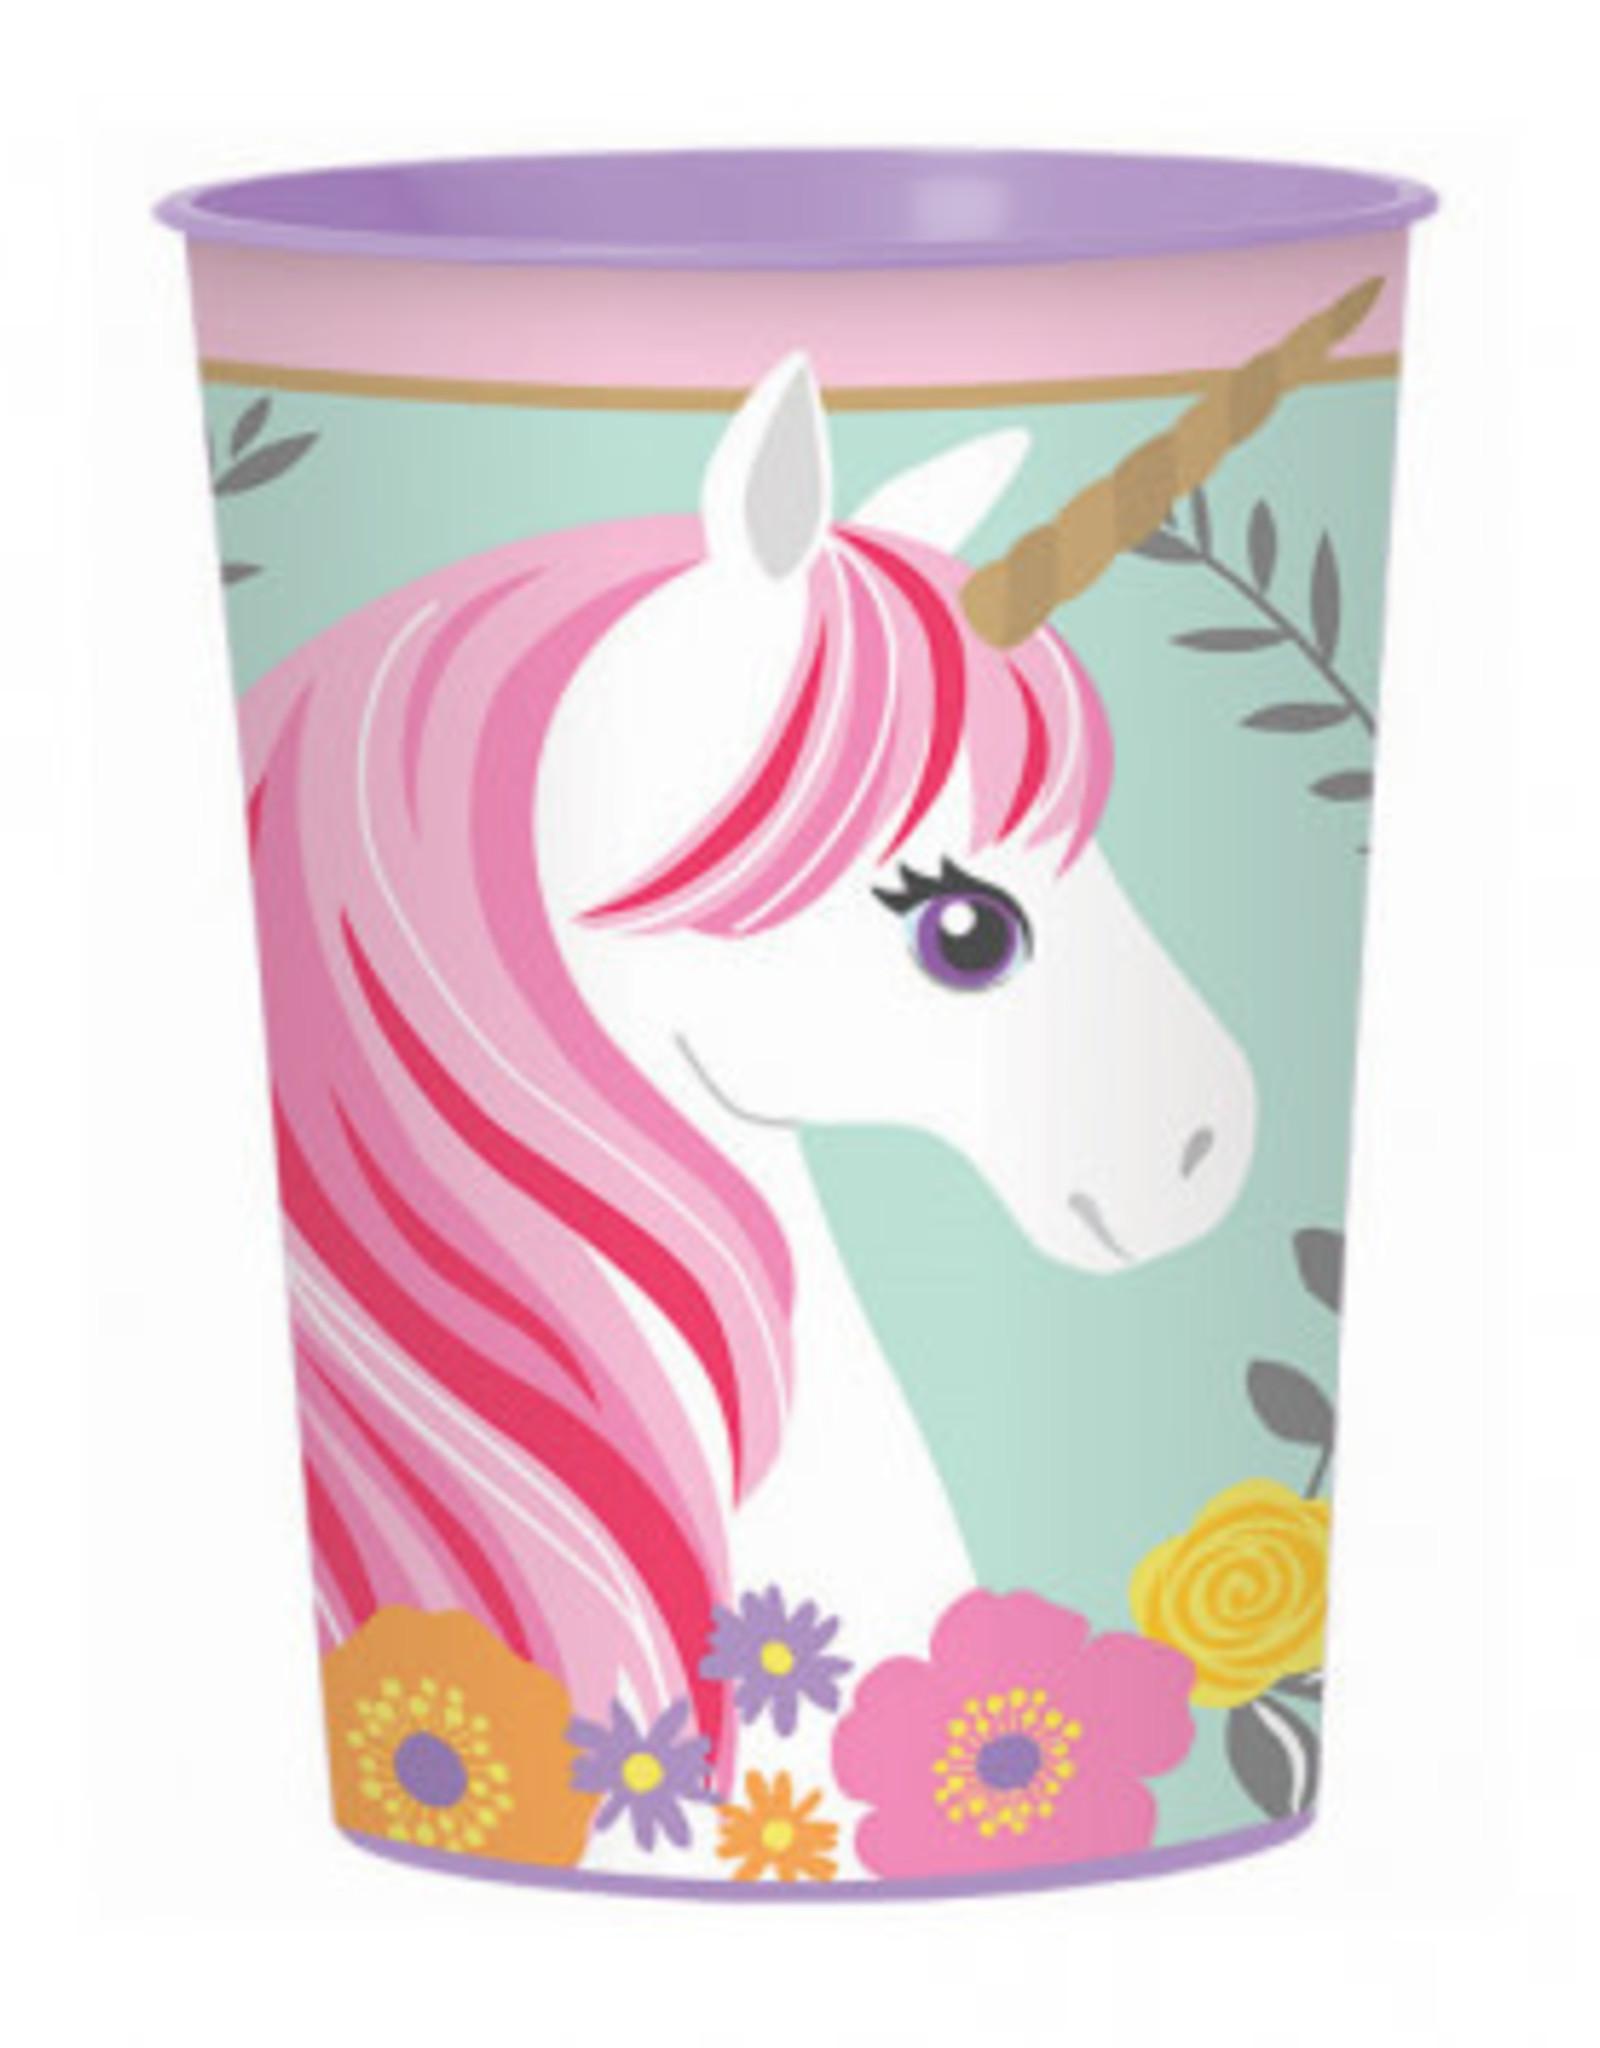 Plastic Reusable Magical Unicorn Cup